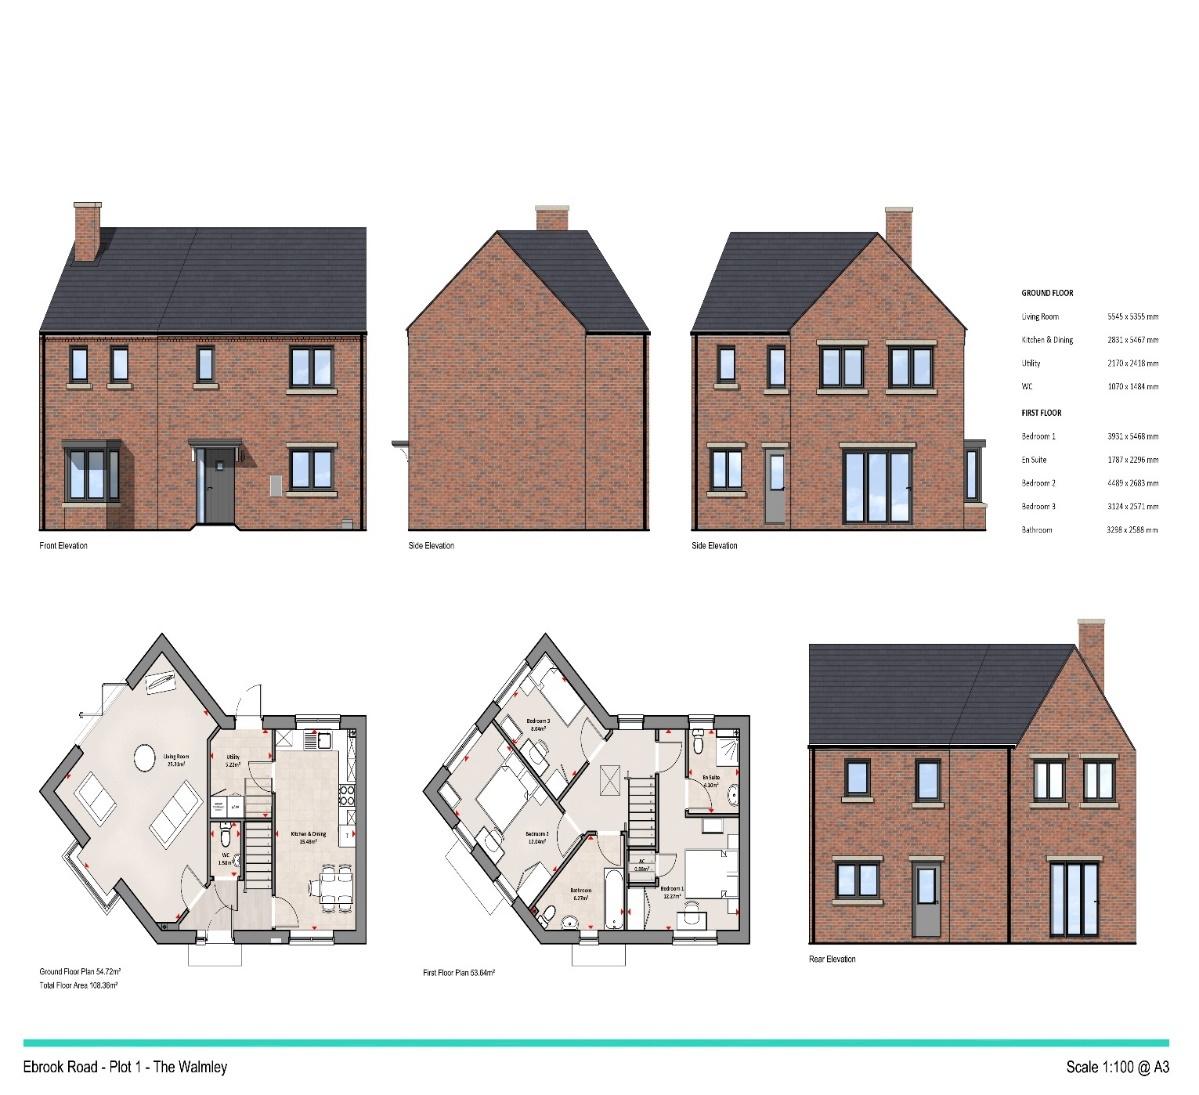 The Walmley Property Plan